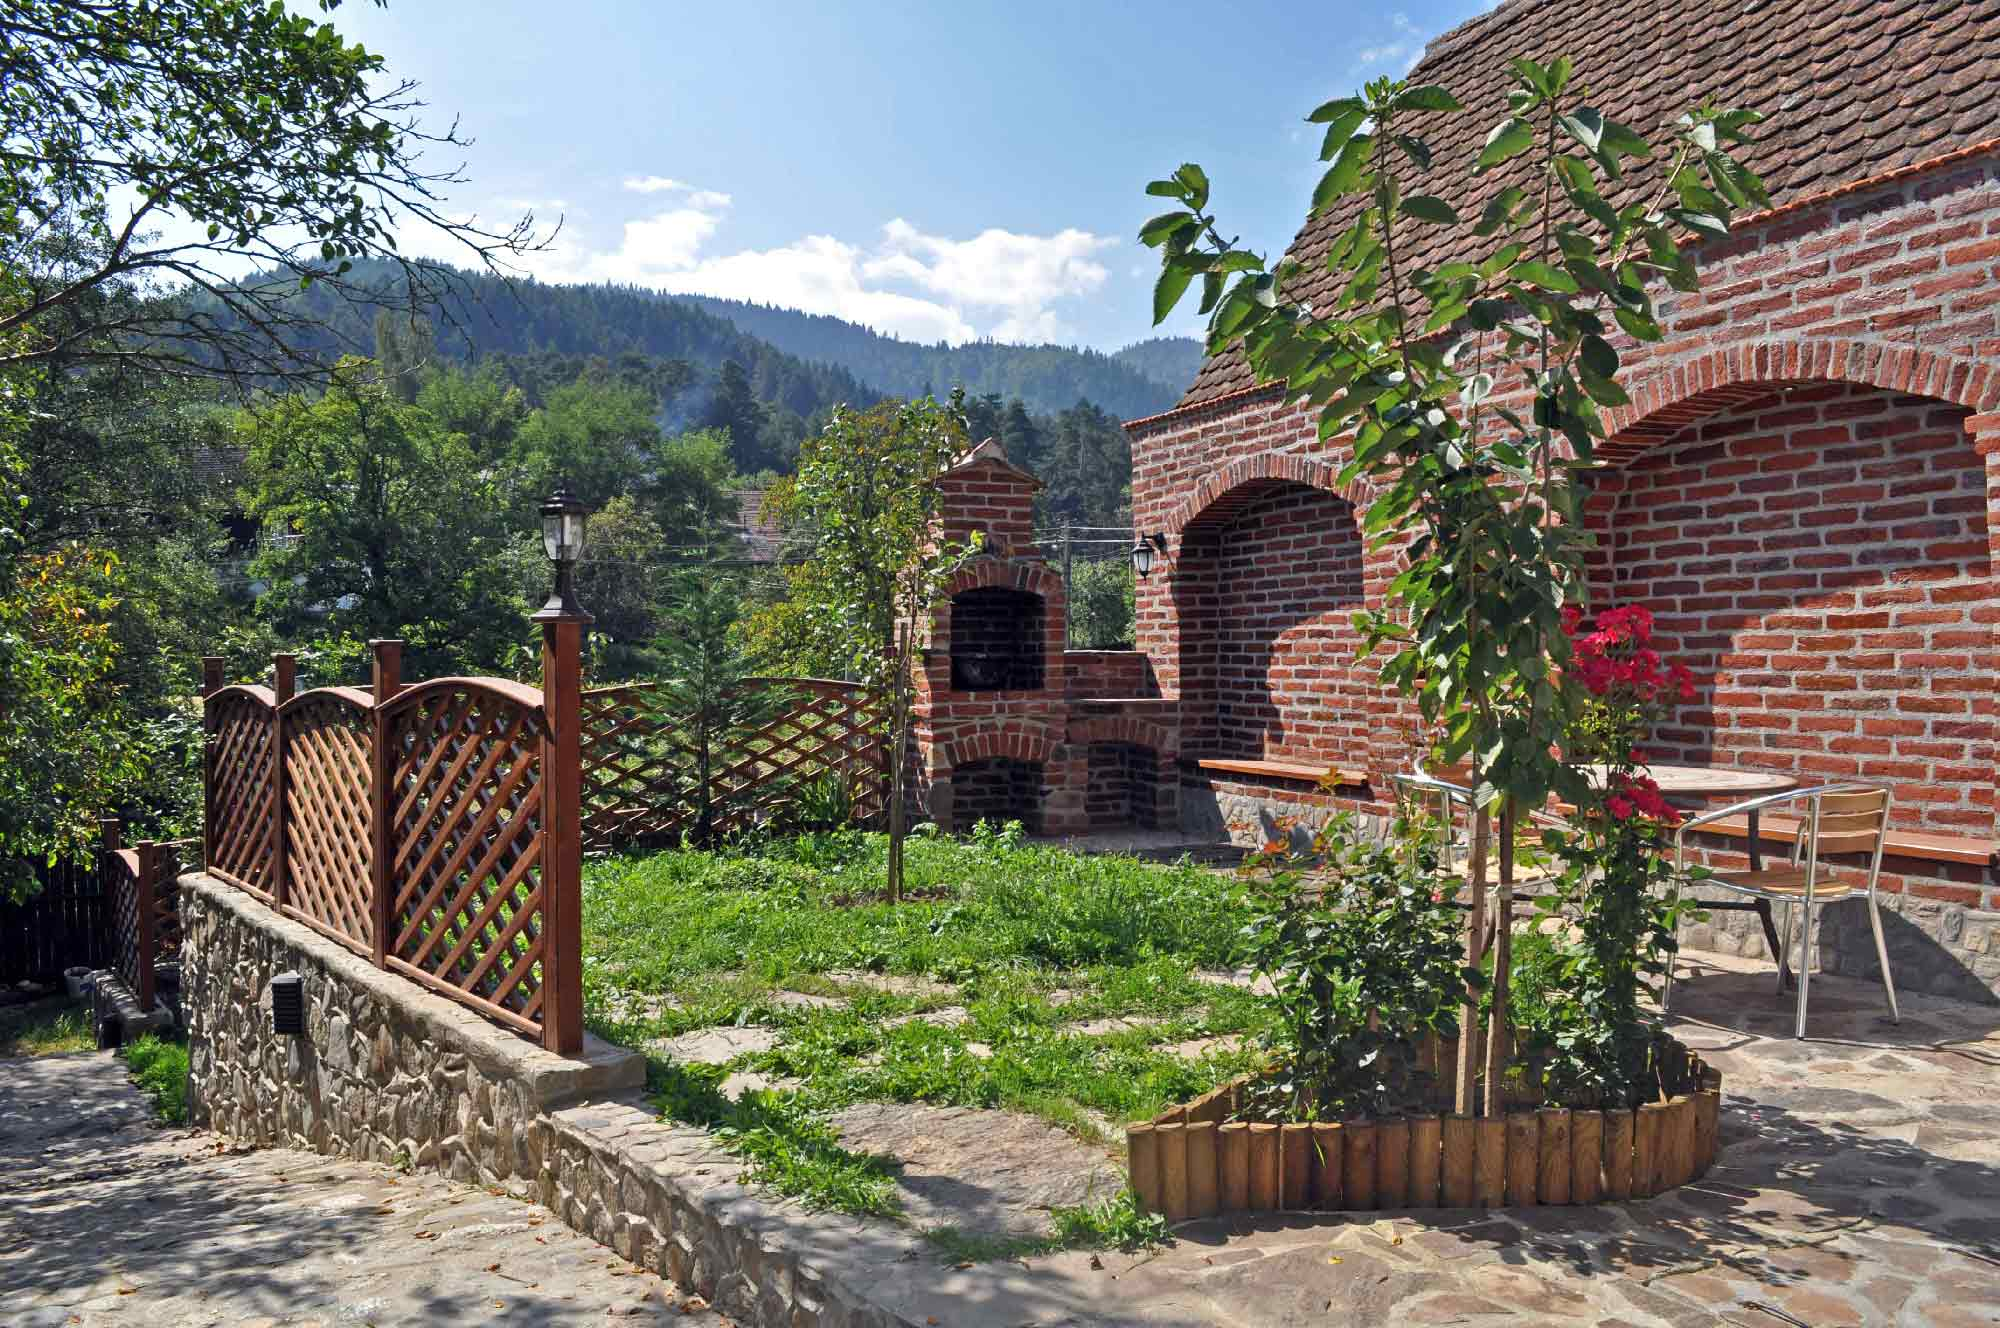 location villa roumanie private aux carpates | sejour vacances sibiu self catering transylvanie